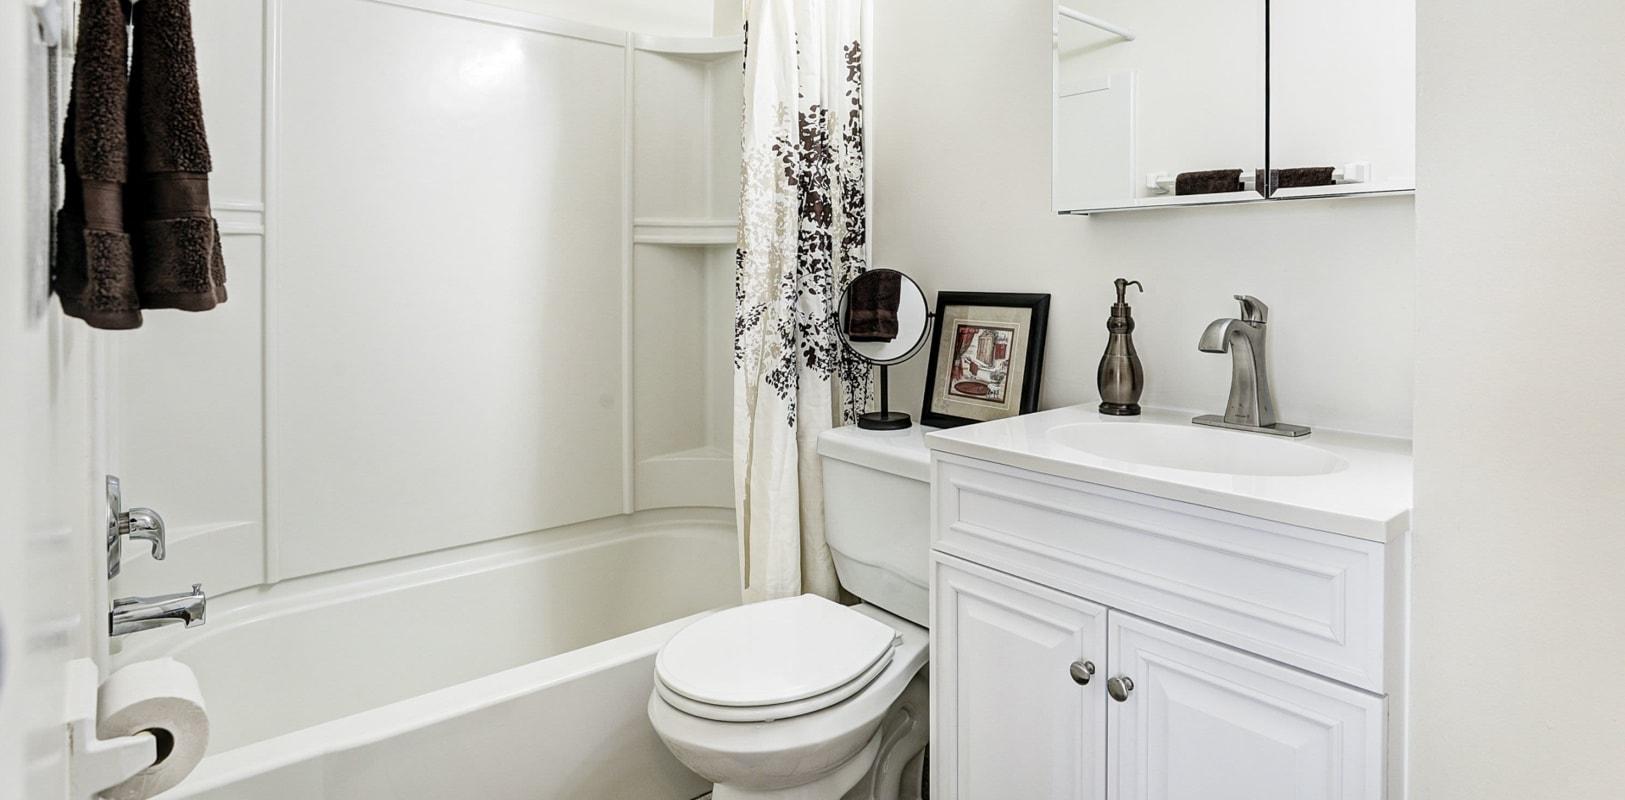 Clean bathroom at Lehigh Plaza Apartments in Bethlehem, Pennsylvania